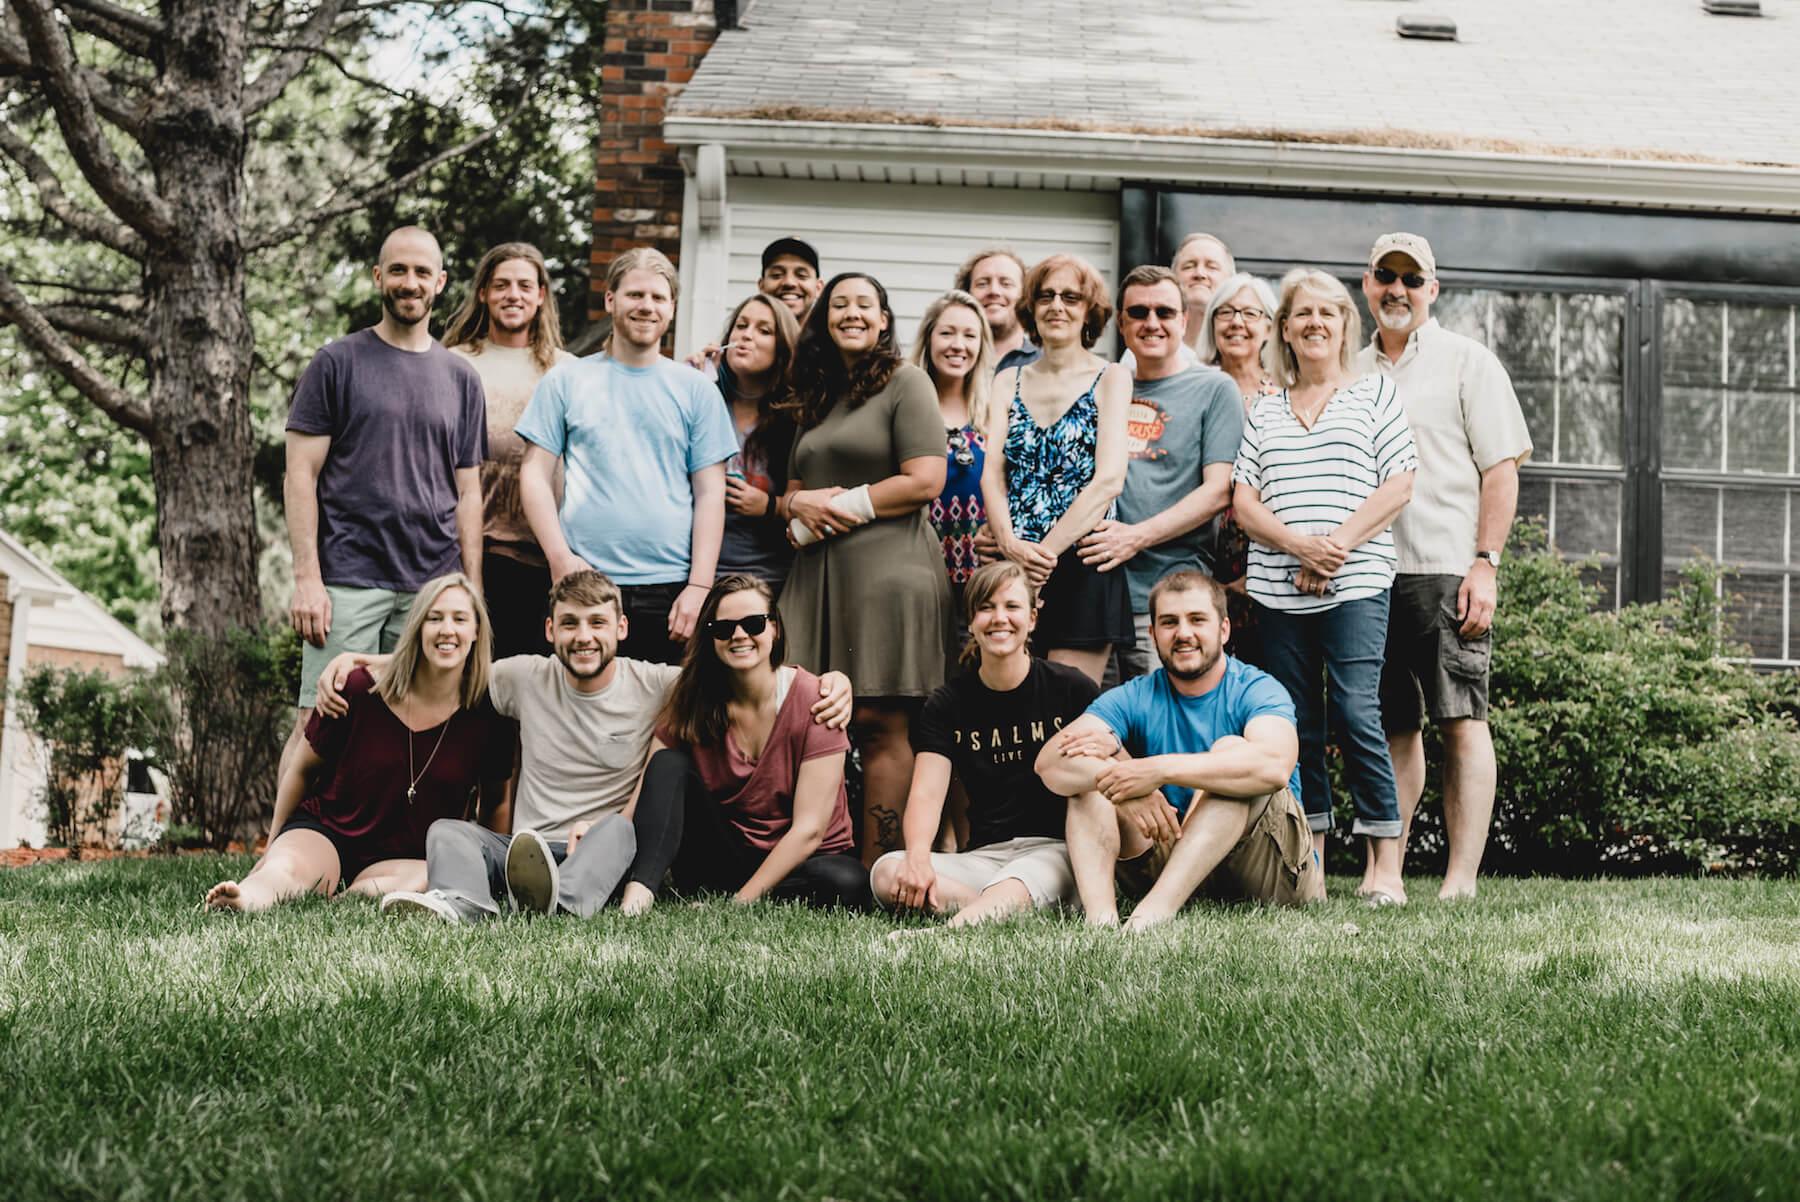 engle-olson-chicago-family-reunion-34.jpg